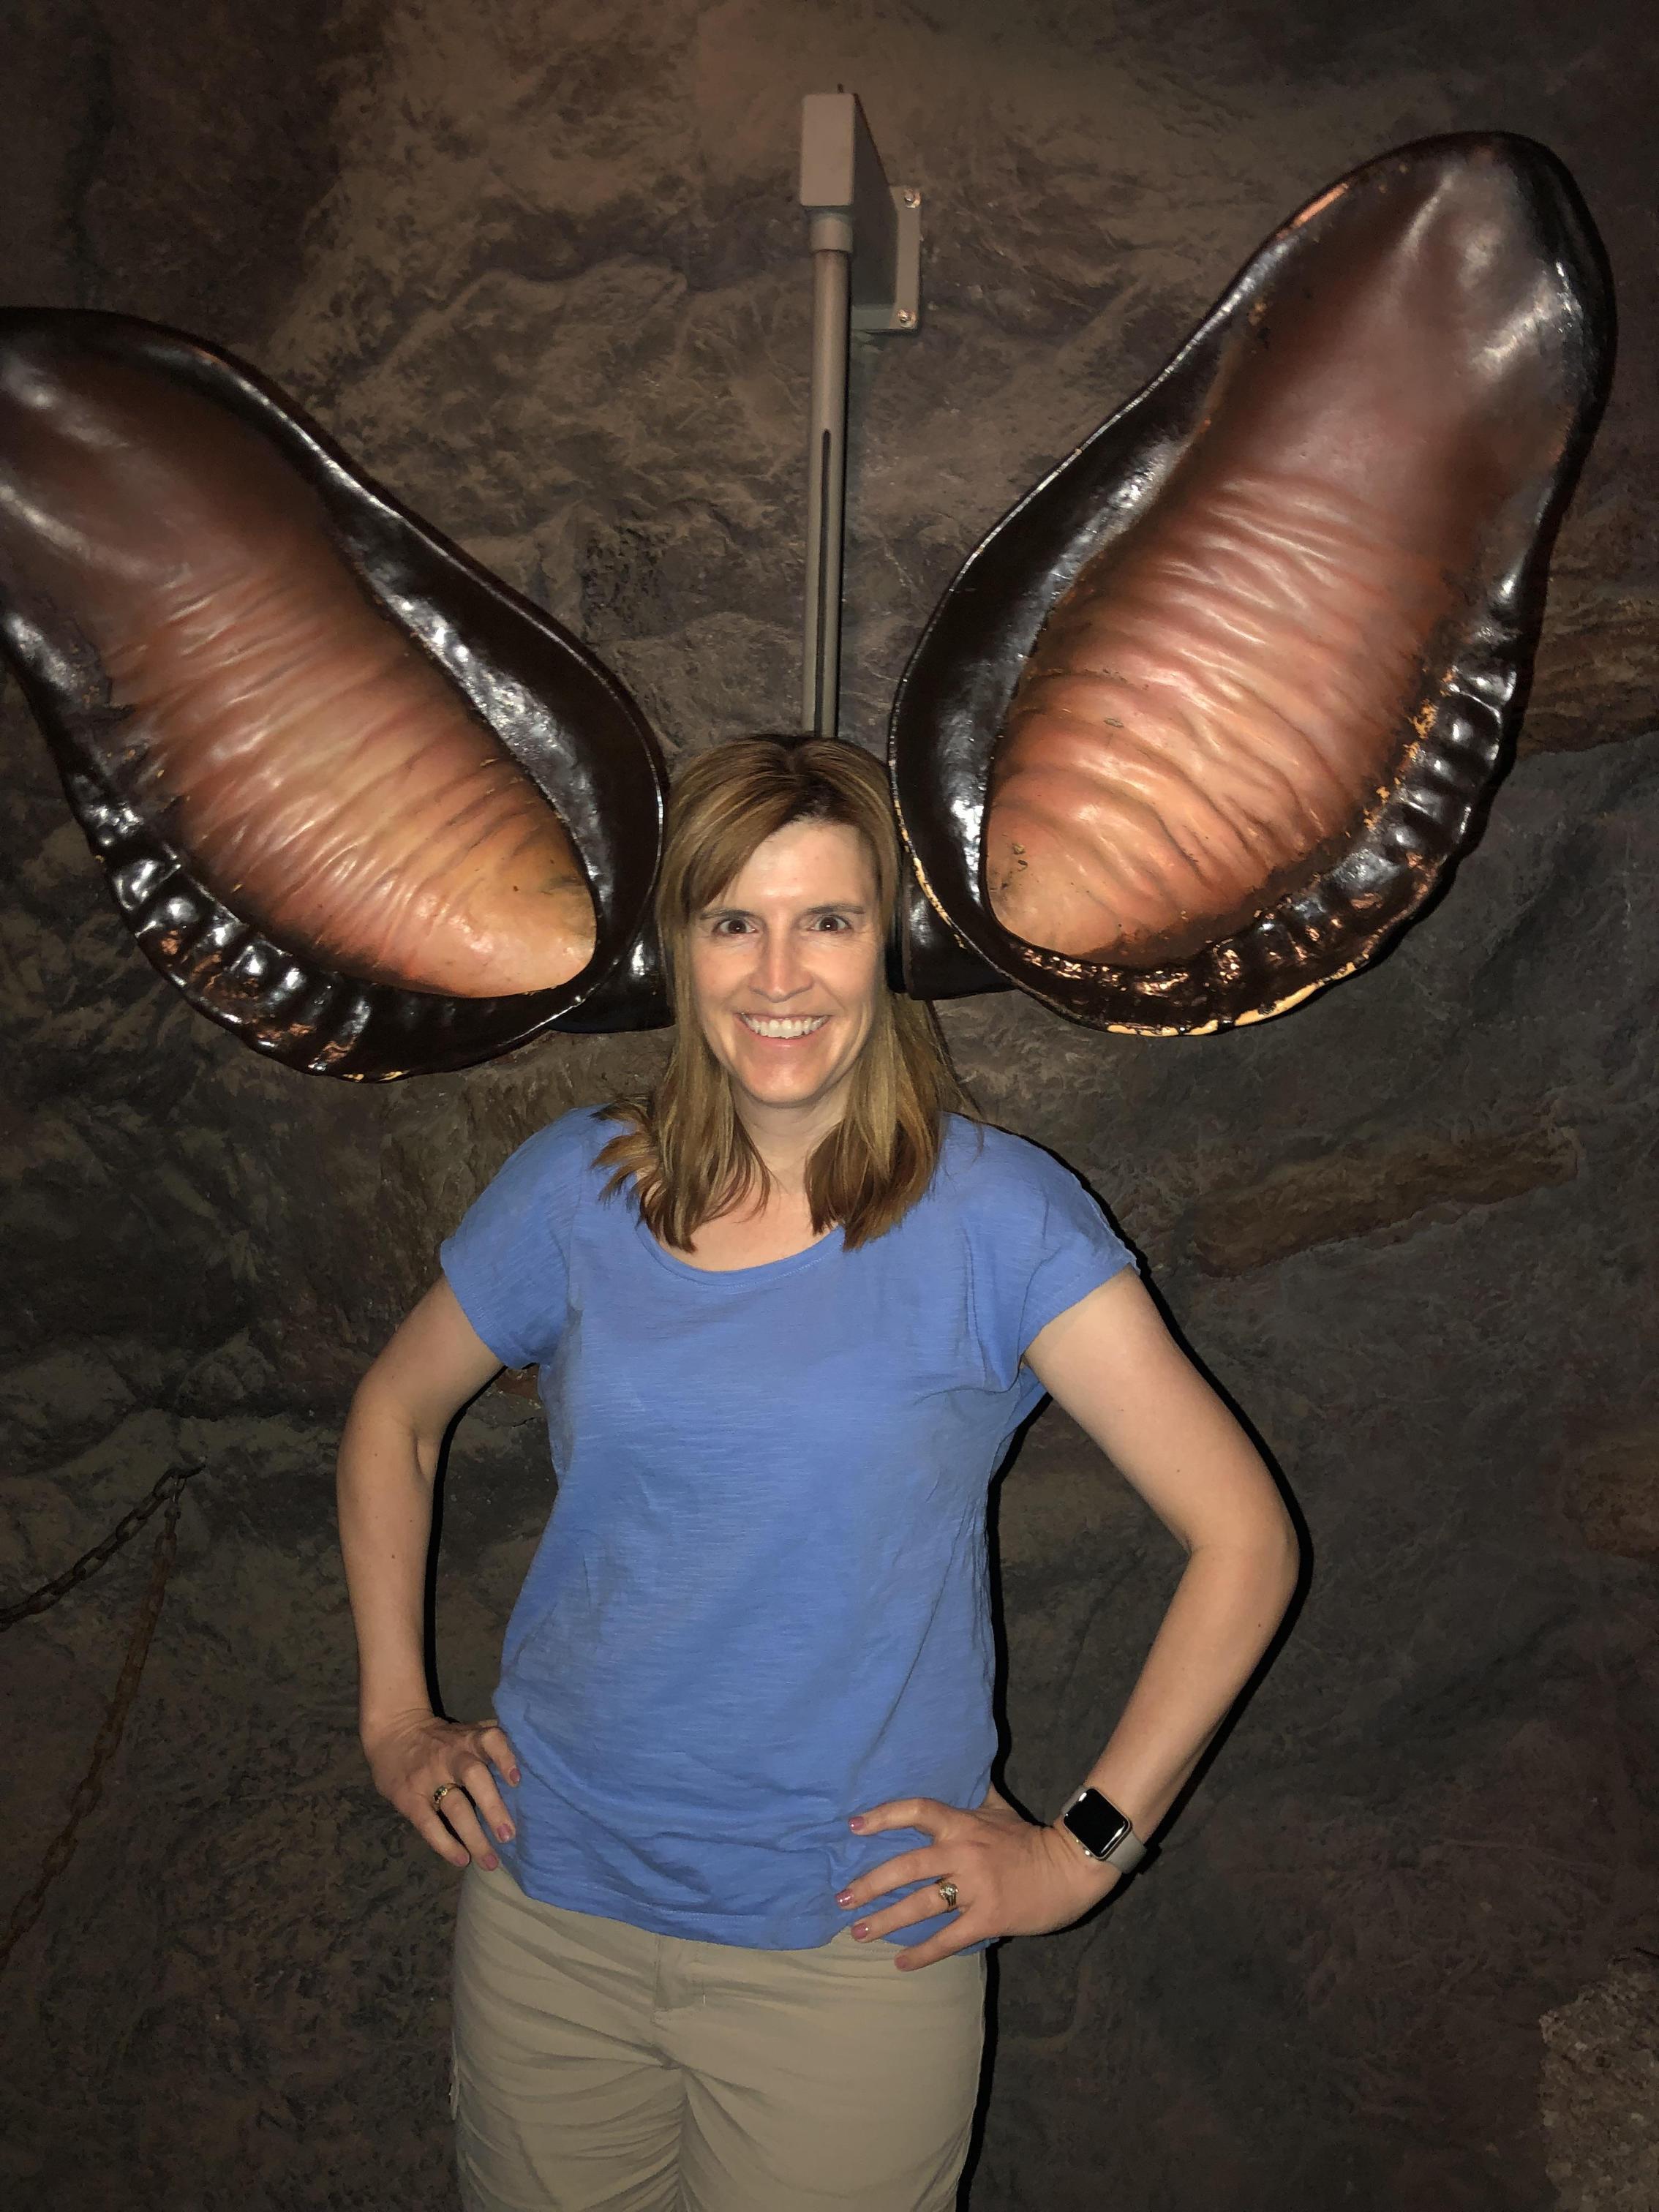 Visiting Tucson, AZ 2019